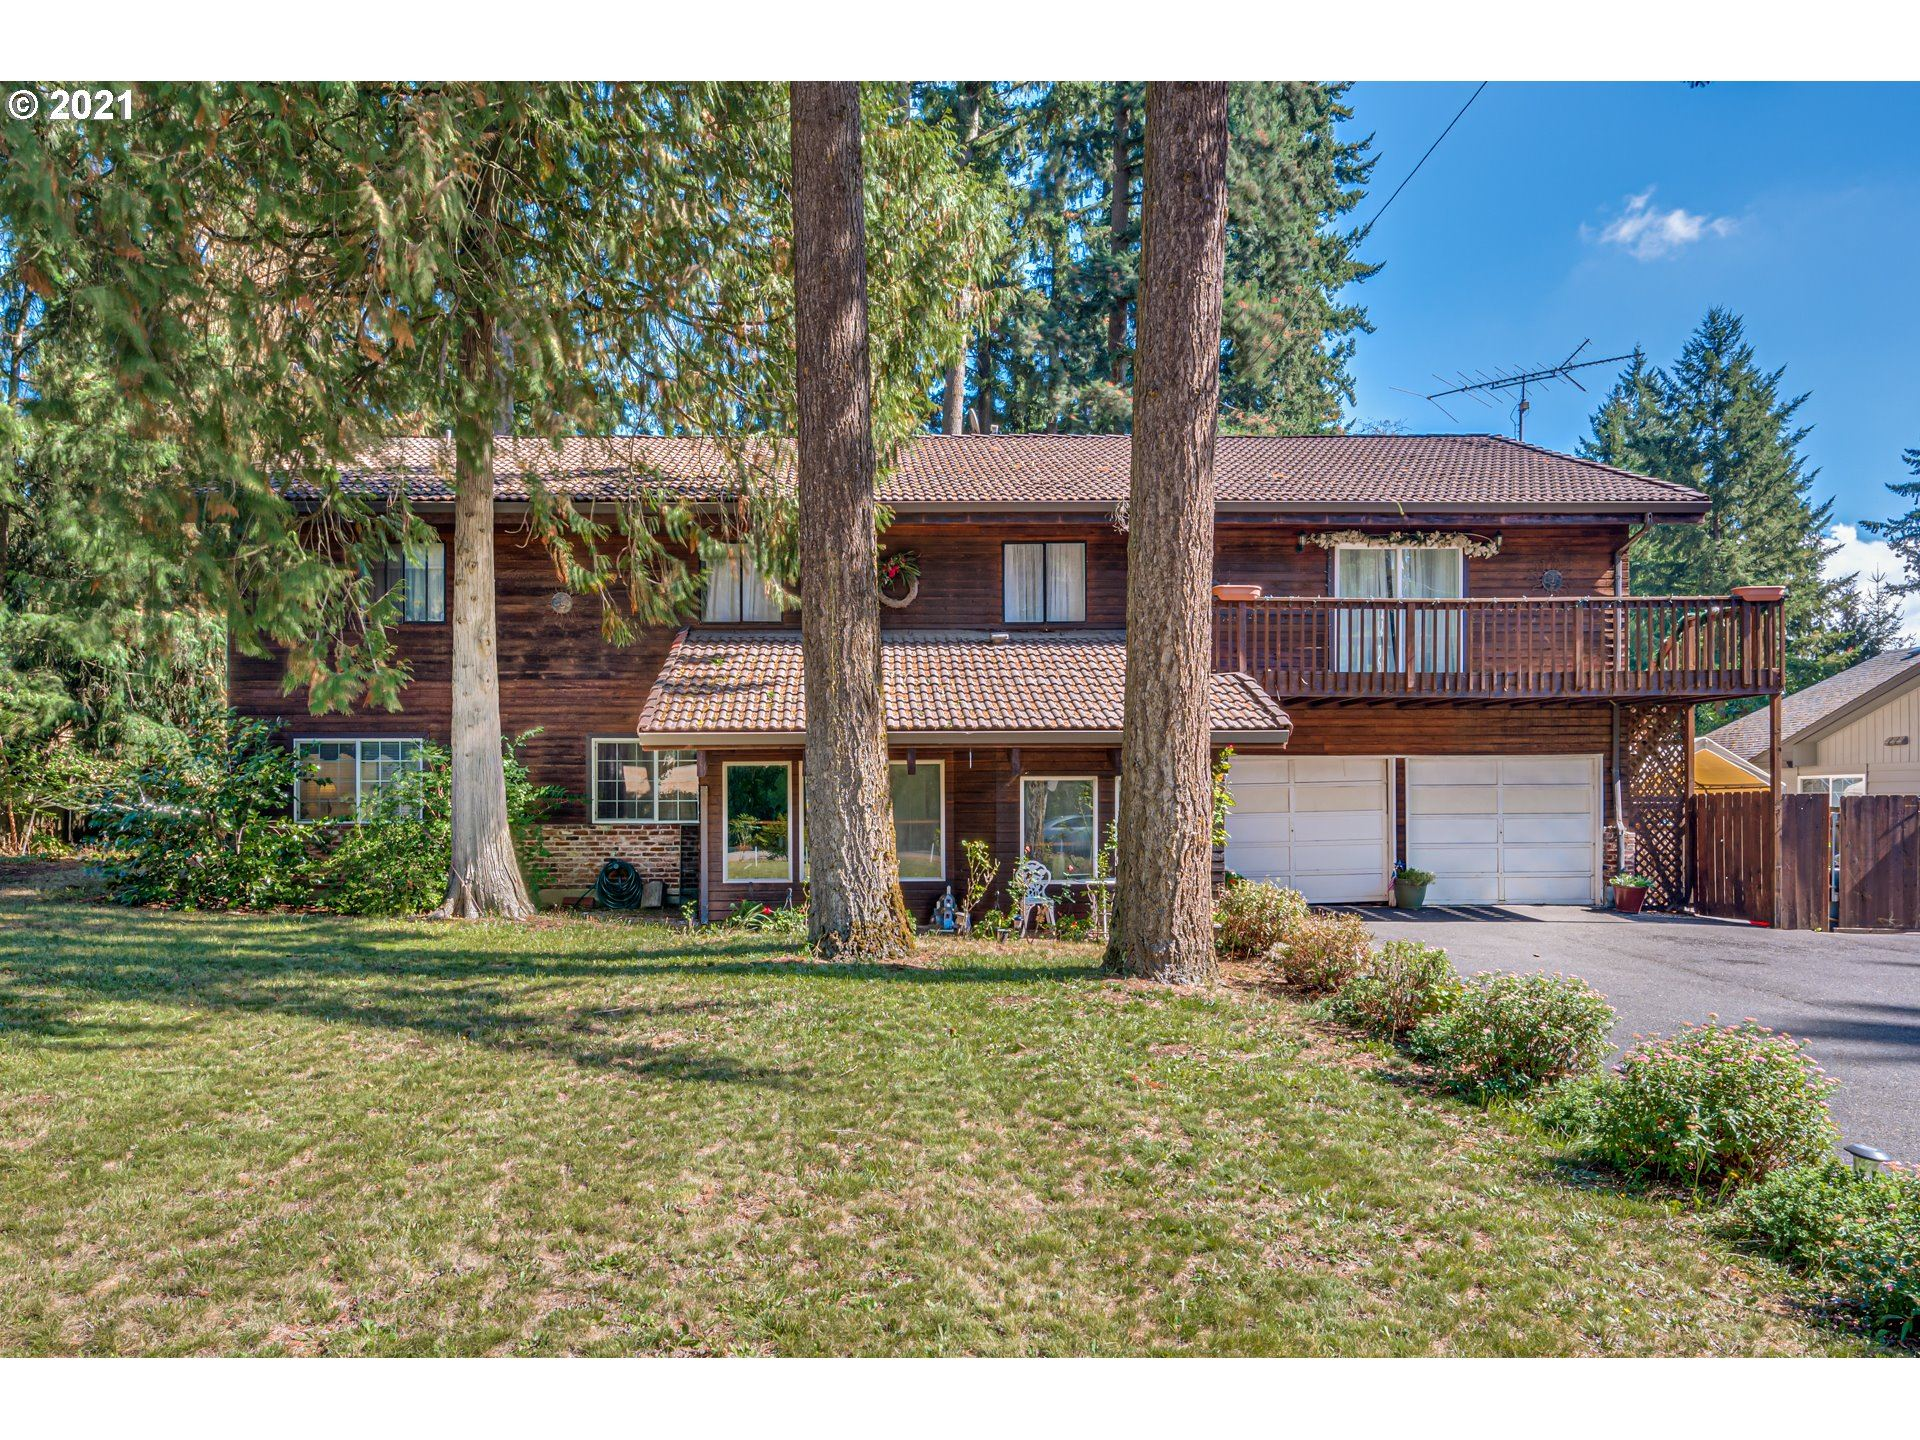 7709 NE 147TH AVE, Vancouver, WA 98682 - MLS#: 21032674